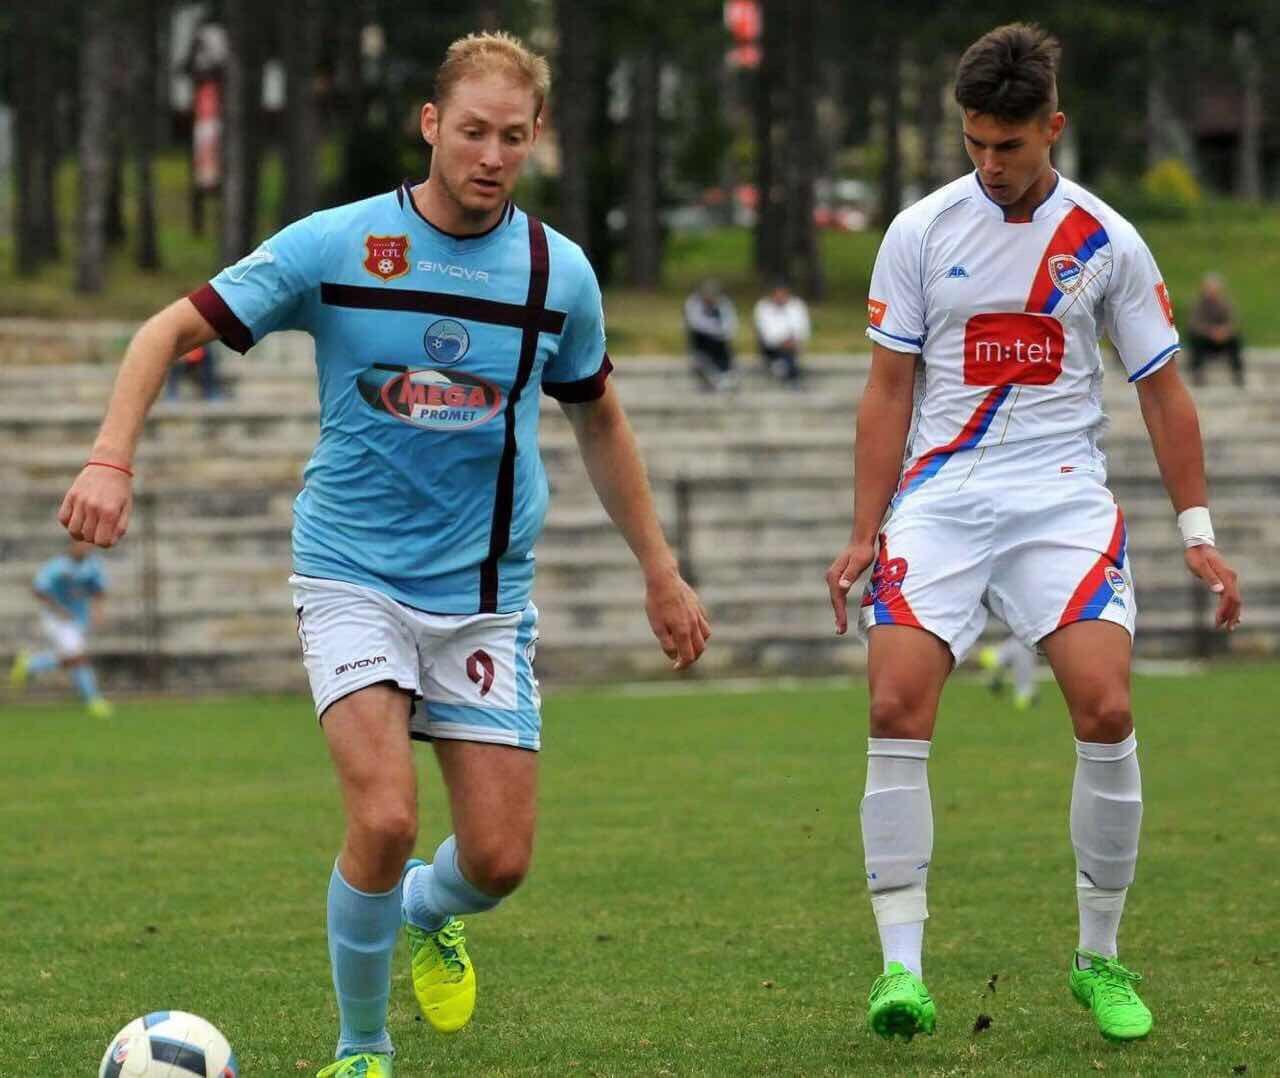 Vujacic with Petrovac FC